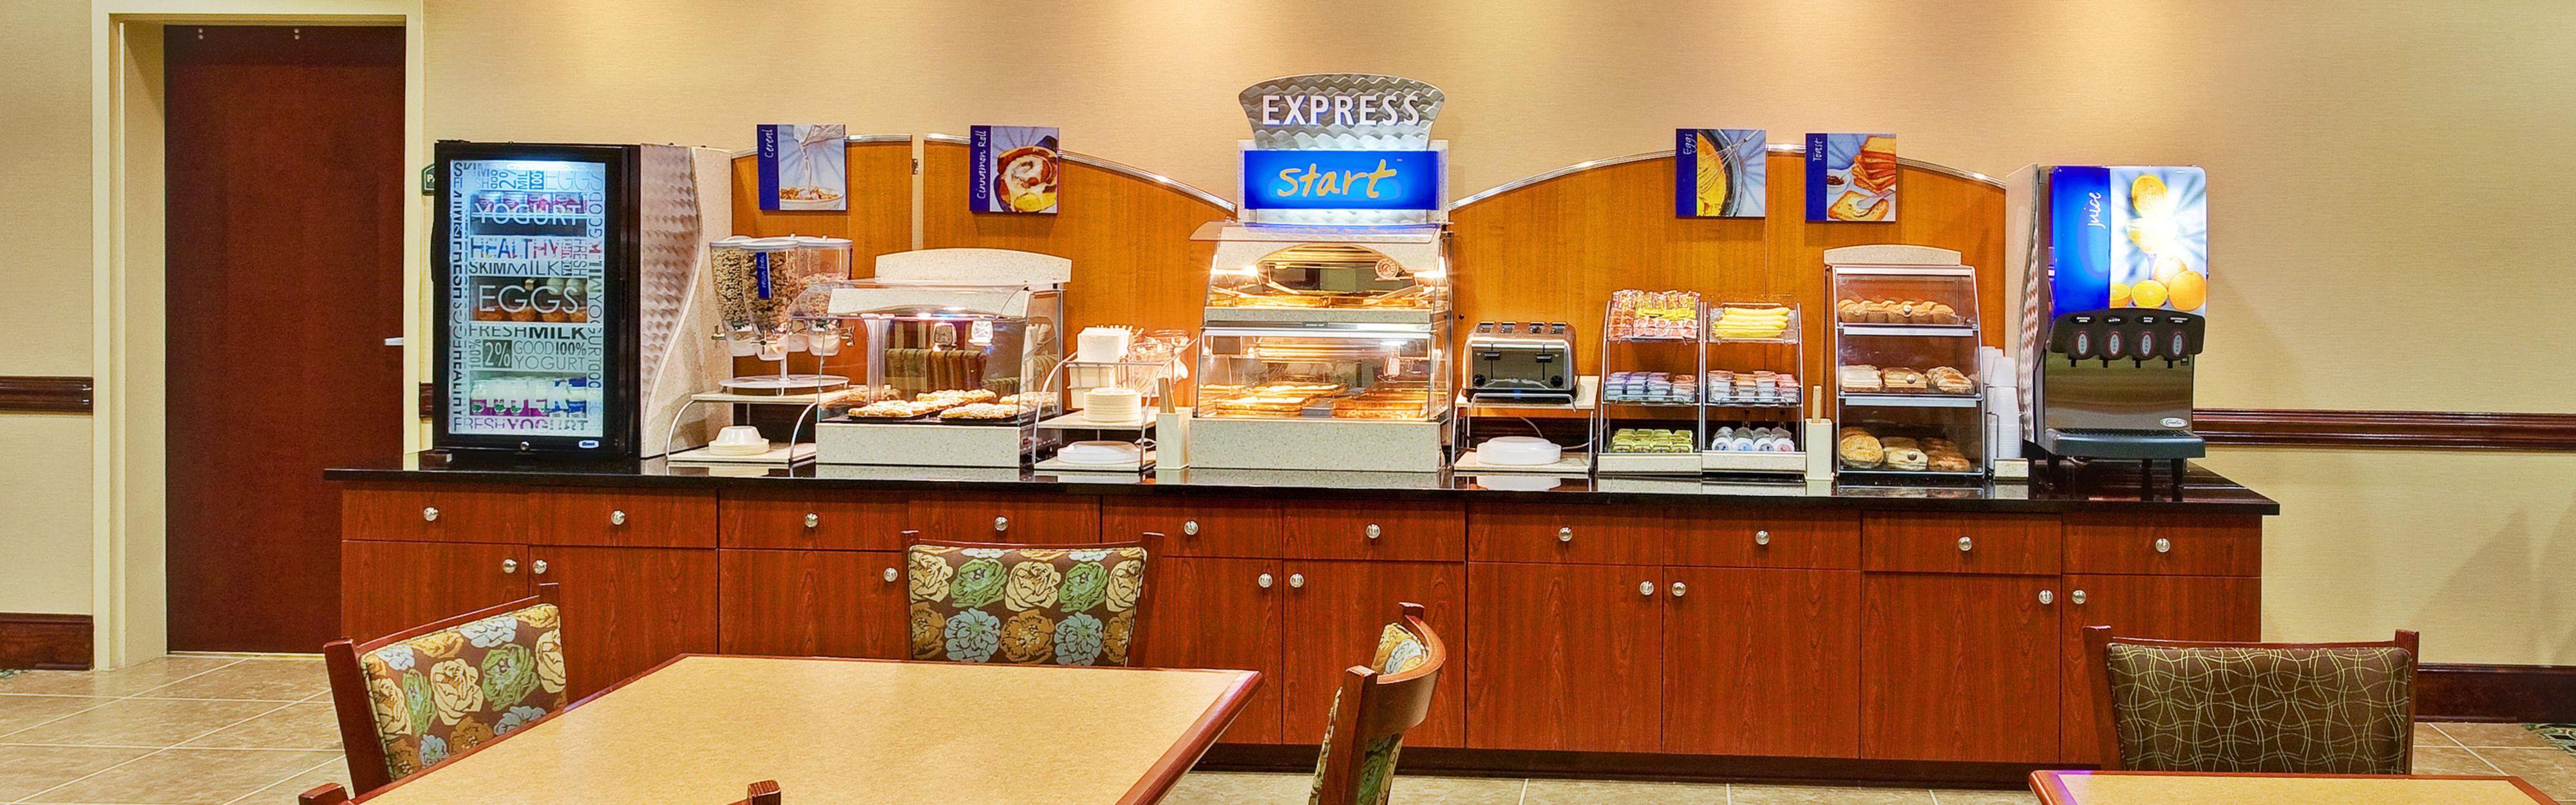 Holiday Inn Express Millington-Memphis Area image 3